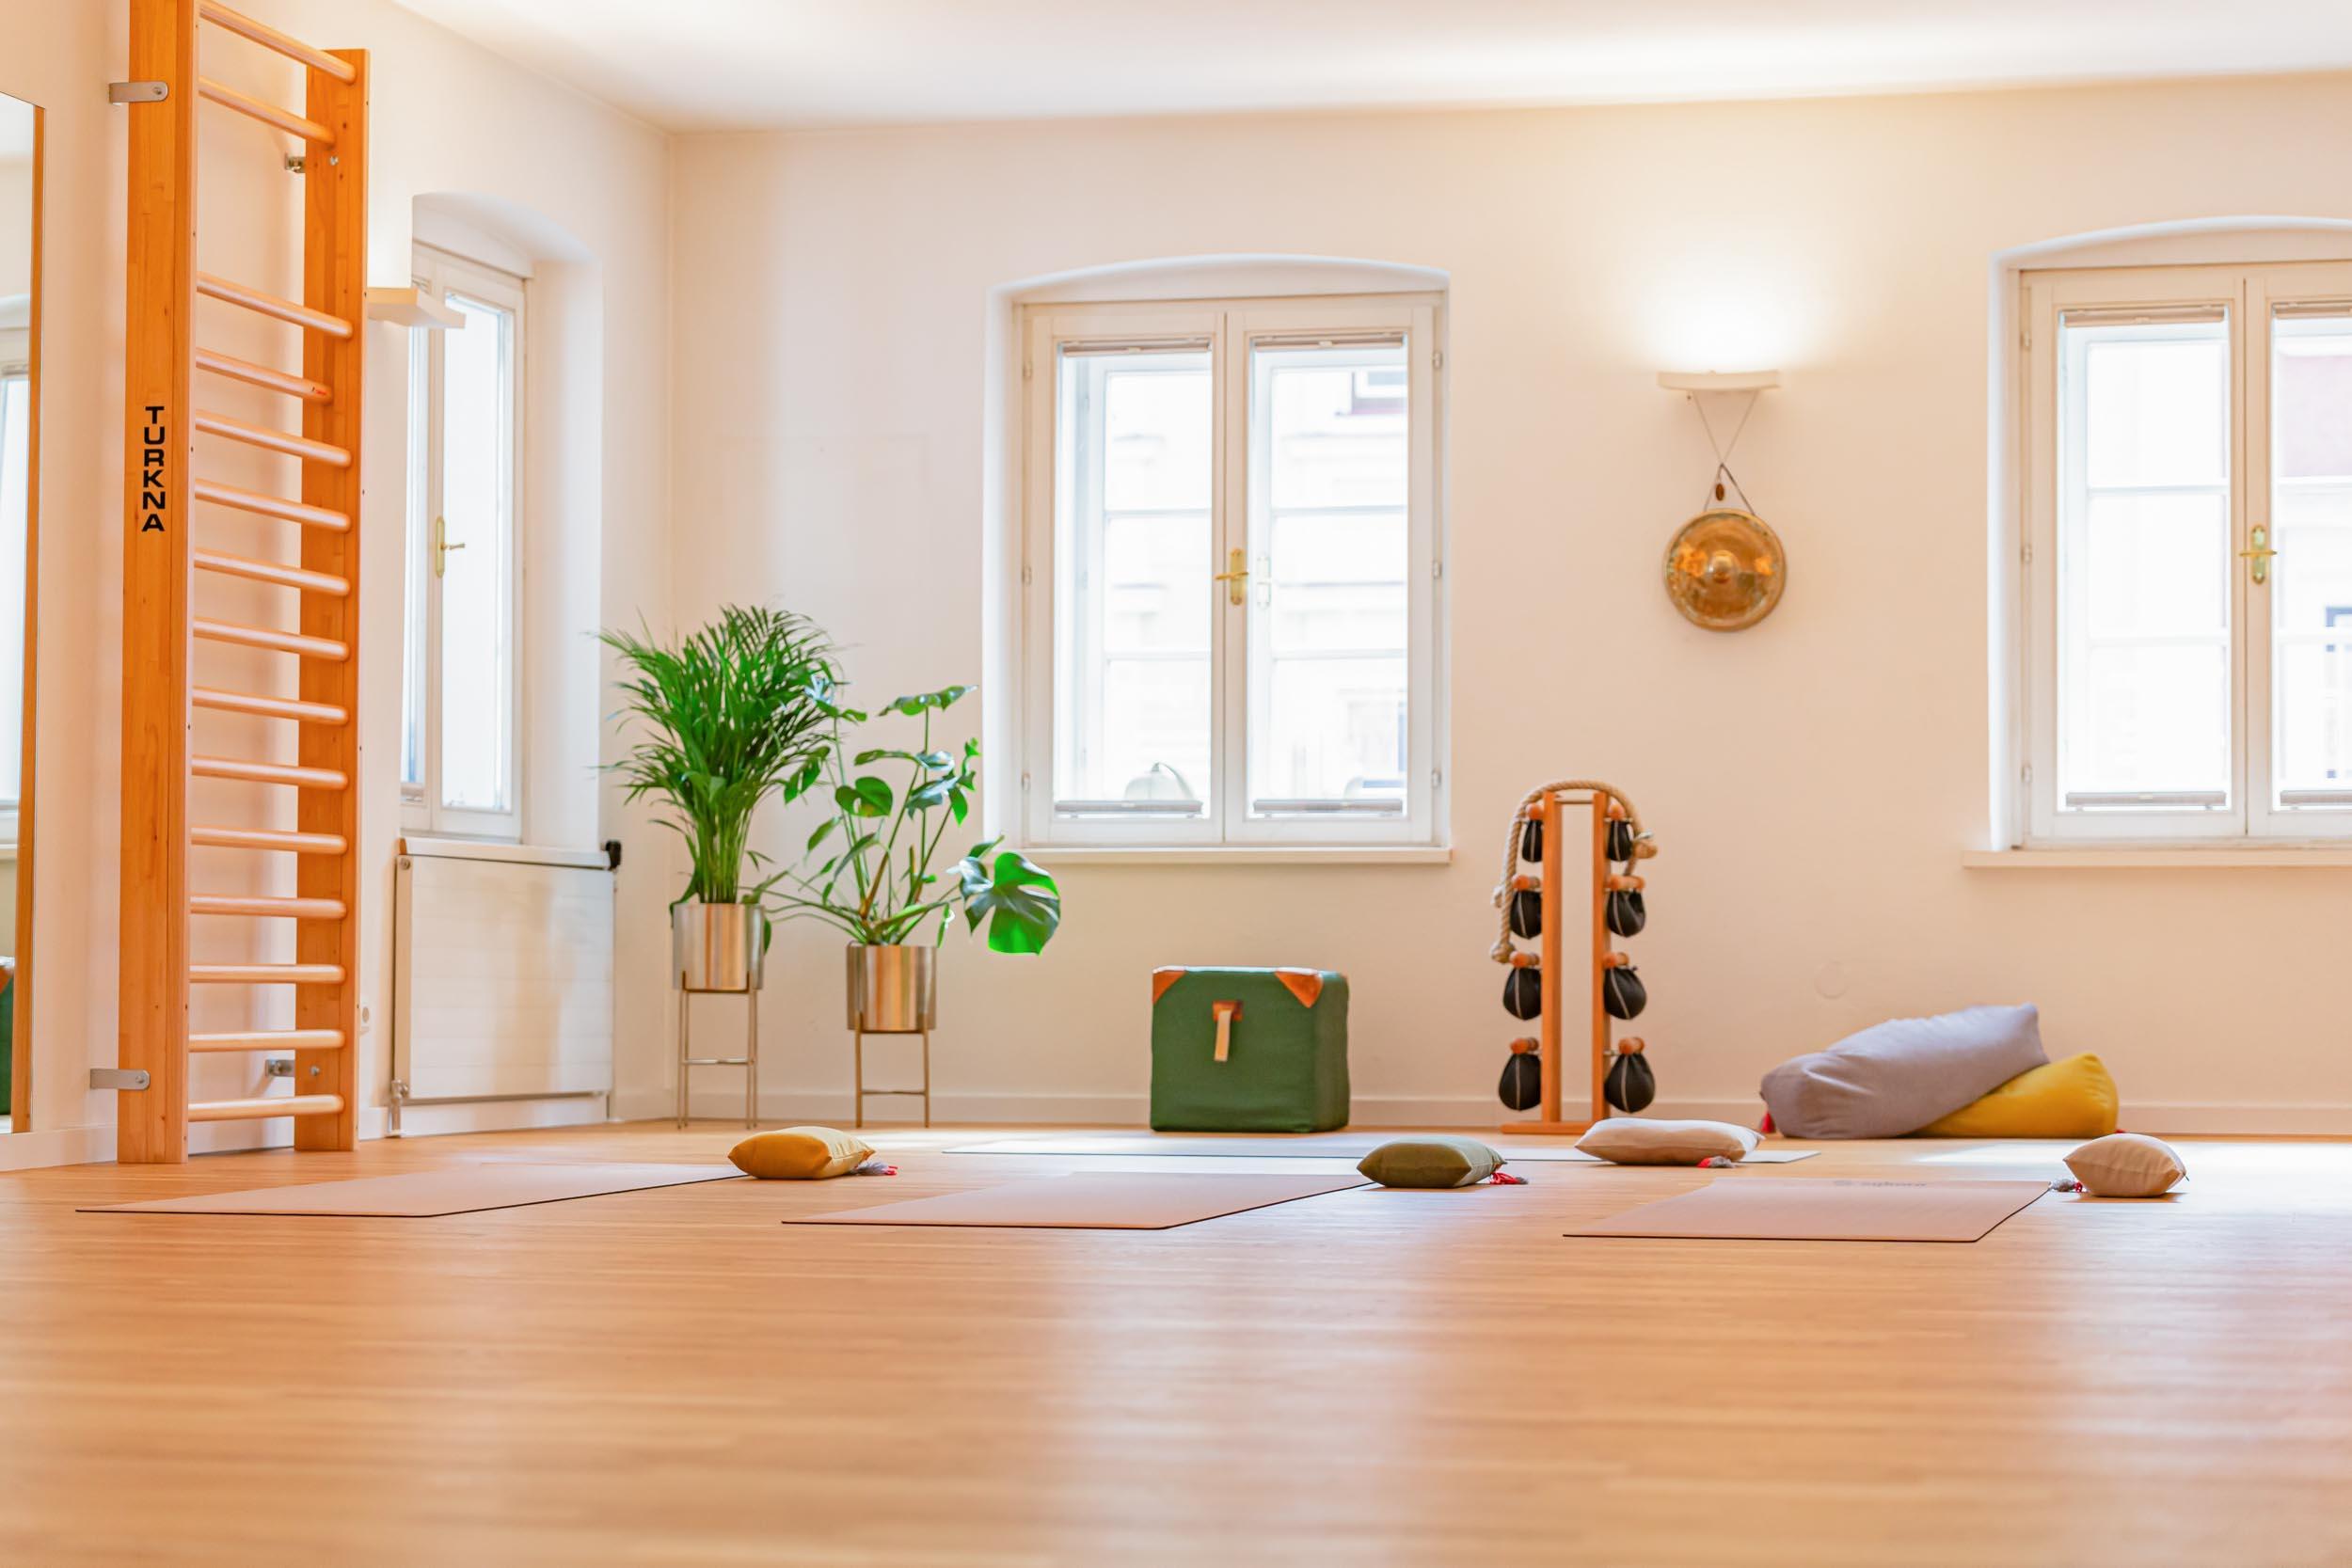 verena sykora | therapie – yoga – training | waidhofen an der yb